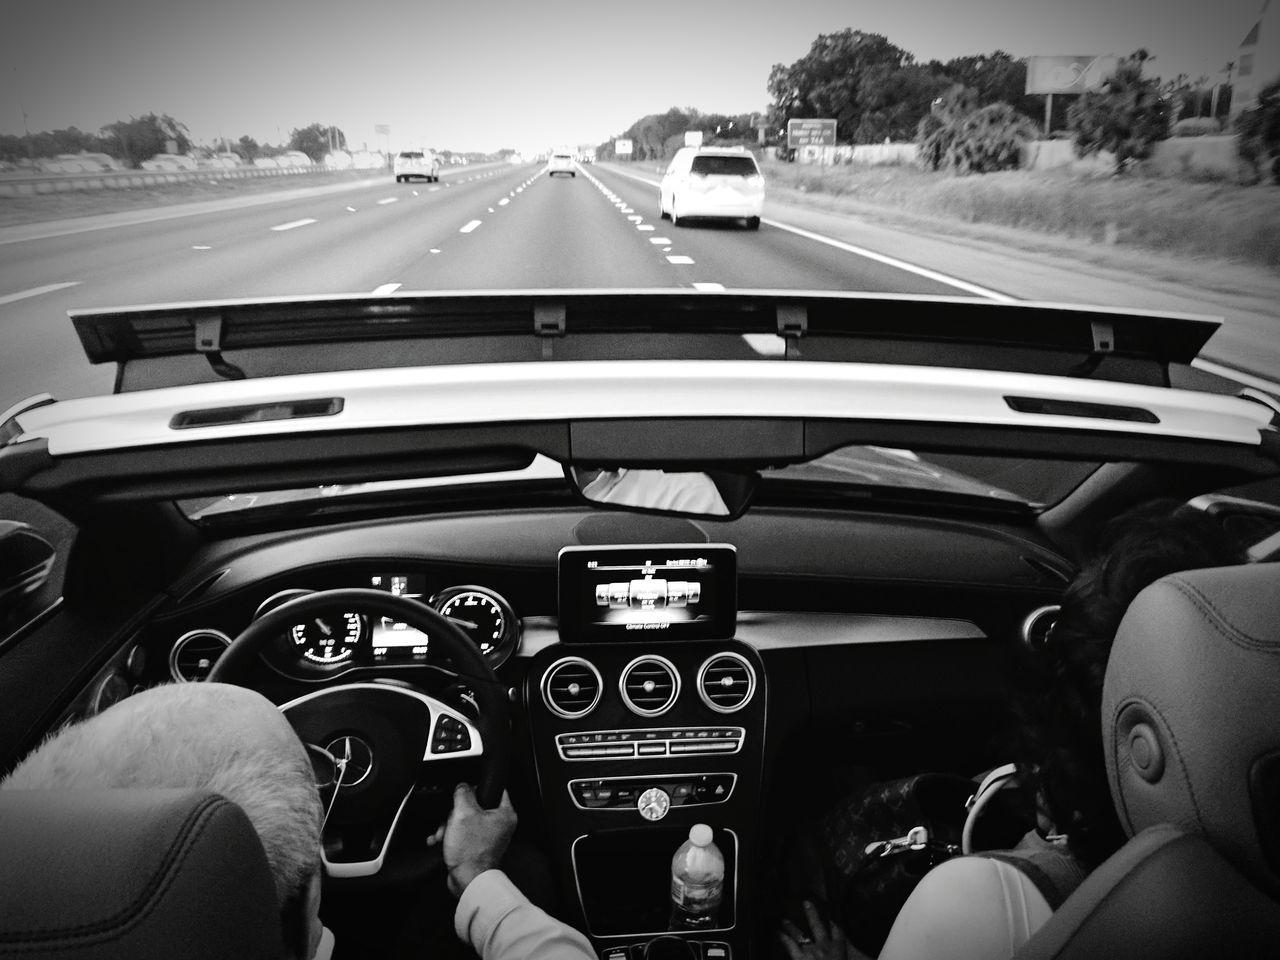 Car Human Body Part Dashboard Car Interior Steering Wheel Mature Adult Day Speedometer Adult Human Hand People Gauge Sky Outdoors Google Pixel XL Transportation Mode Of Transport Land Vehicle Mercedes-Benz Mercedes Top Down Convertible Car Convertible Ride